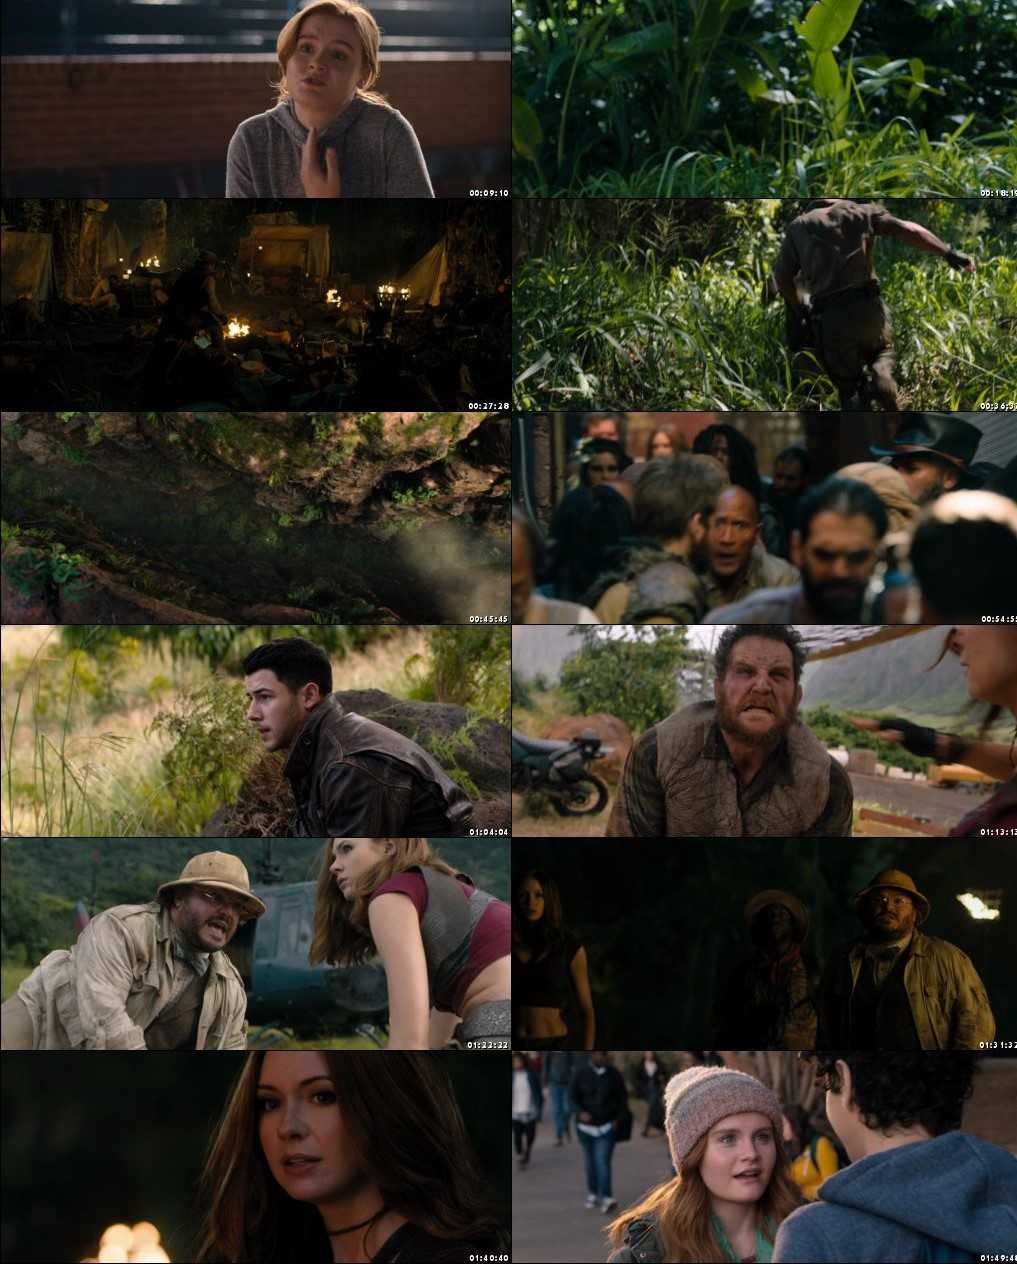 Jumanji: Welcome to the Jungle 2017 Screenshot